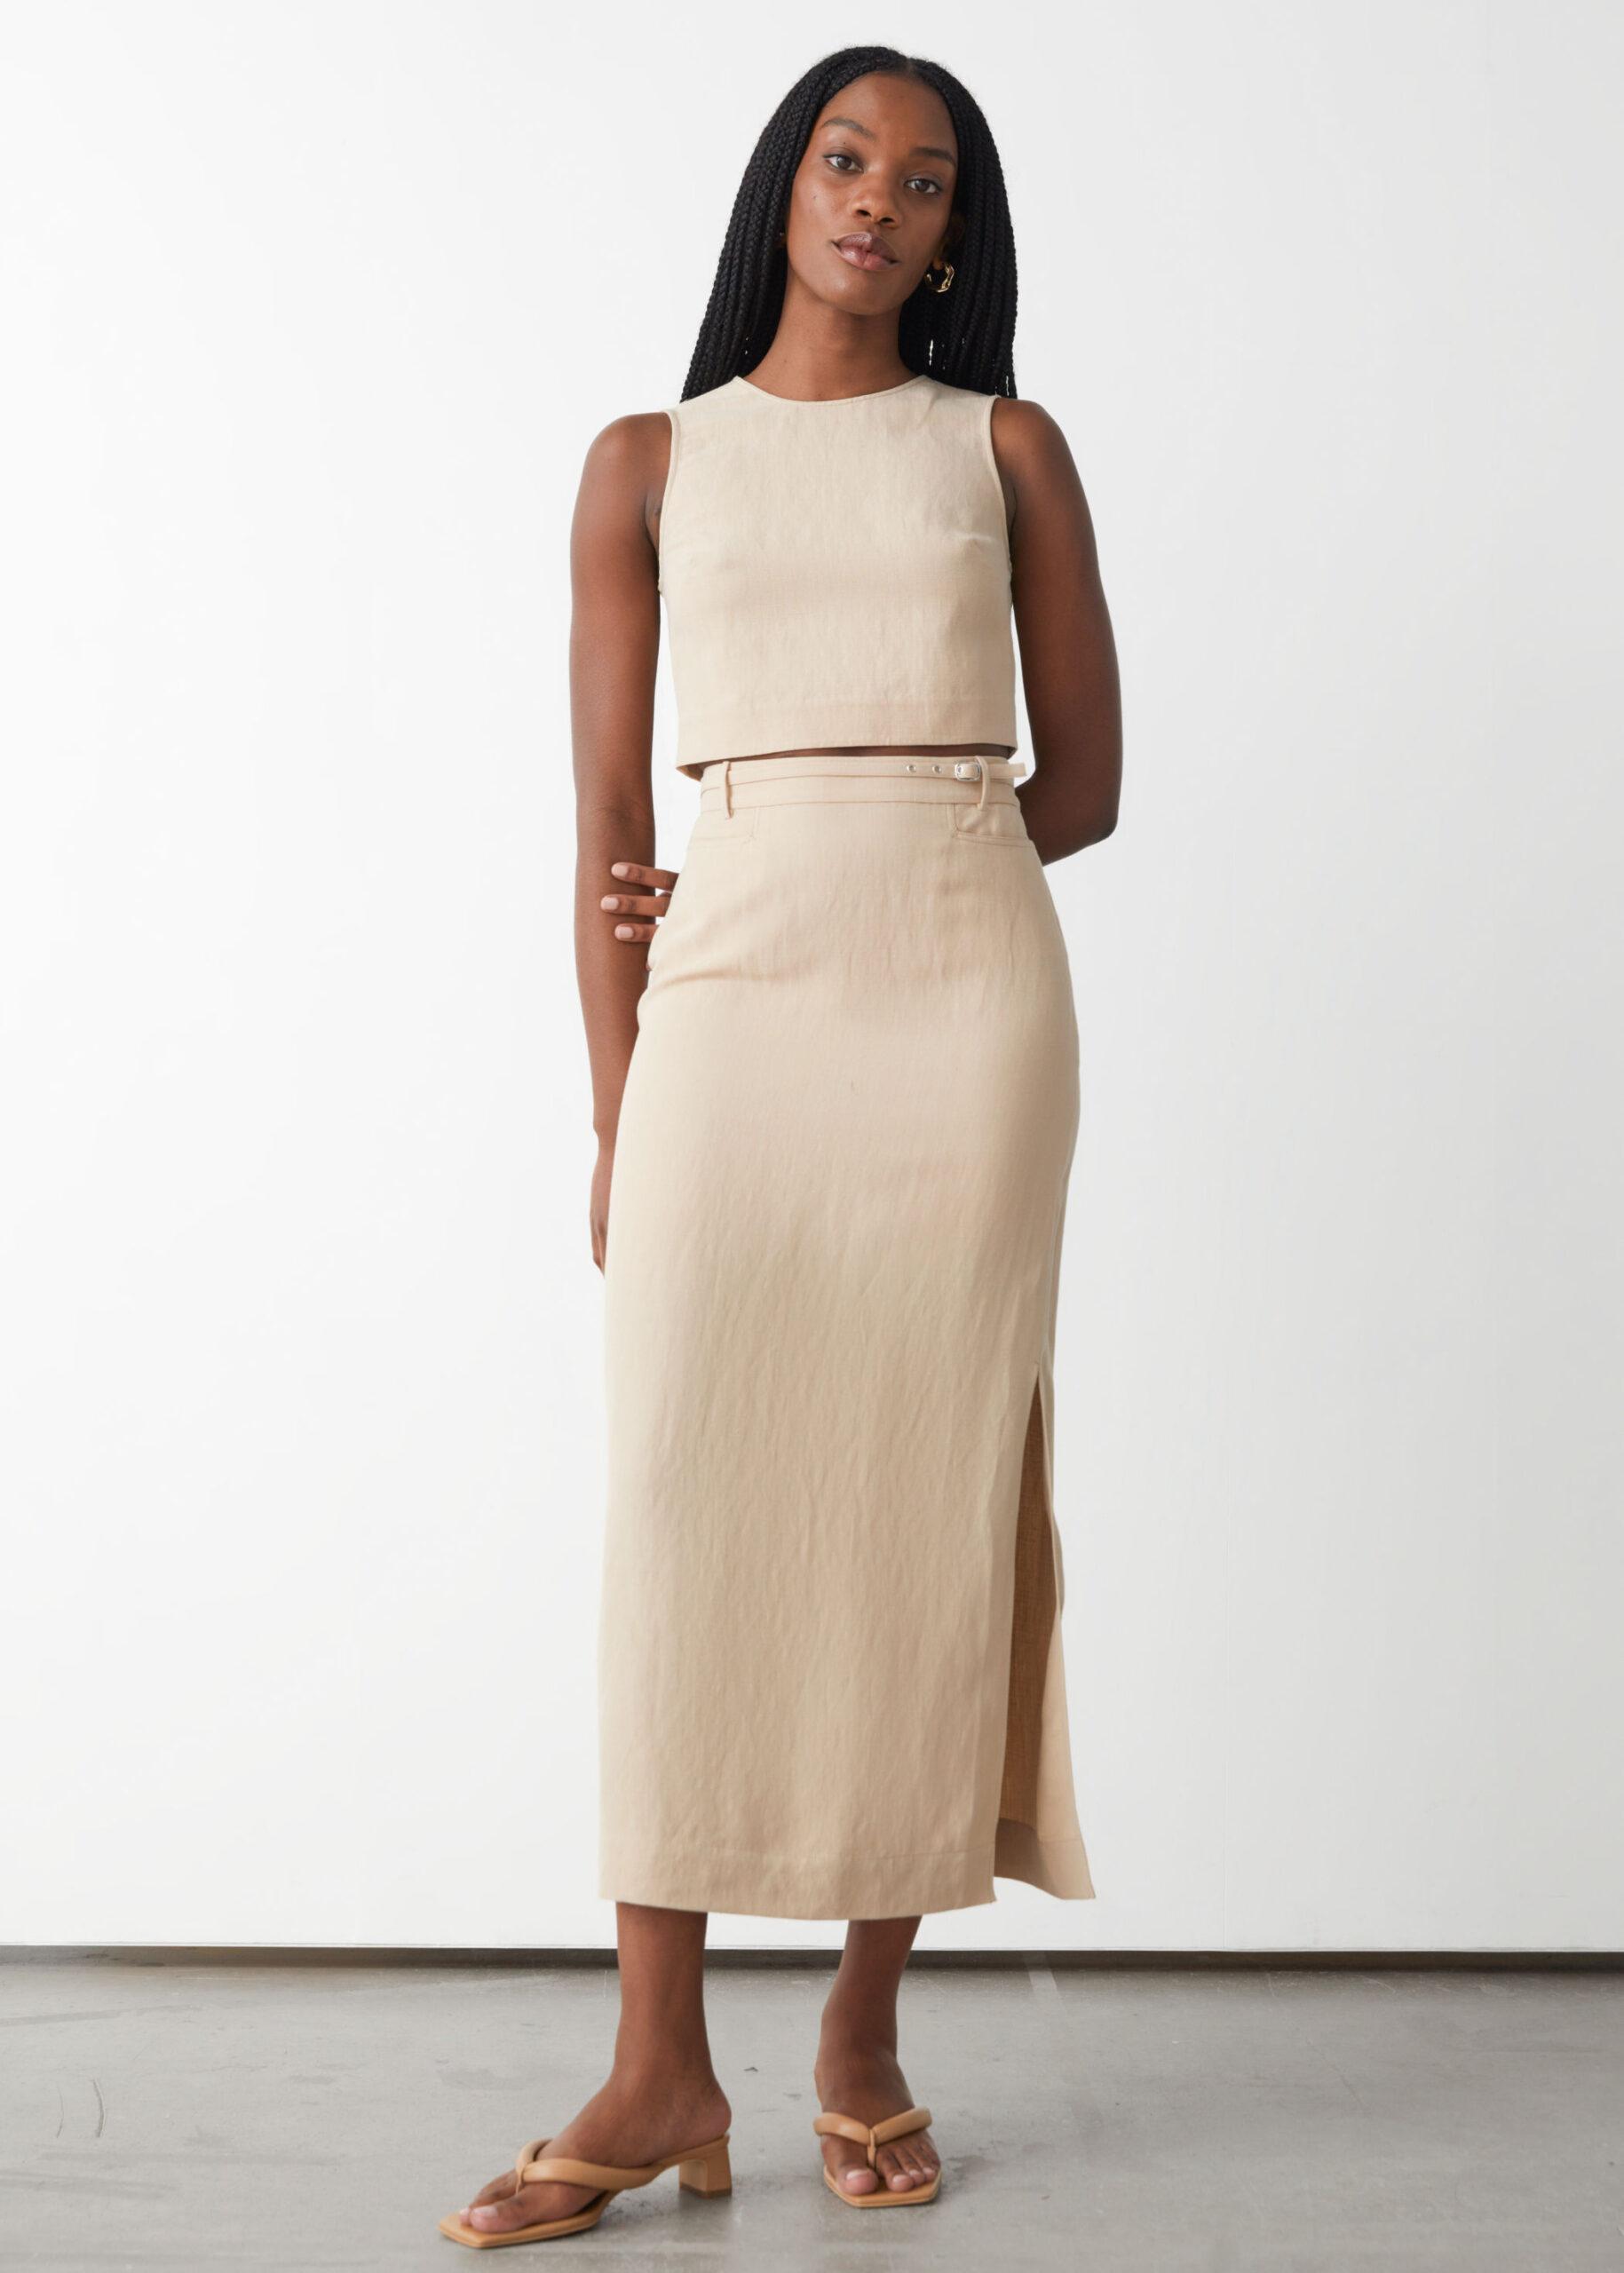 Belted Silk Midi Skirt $99